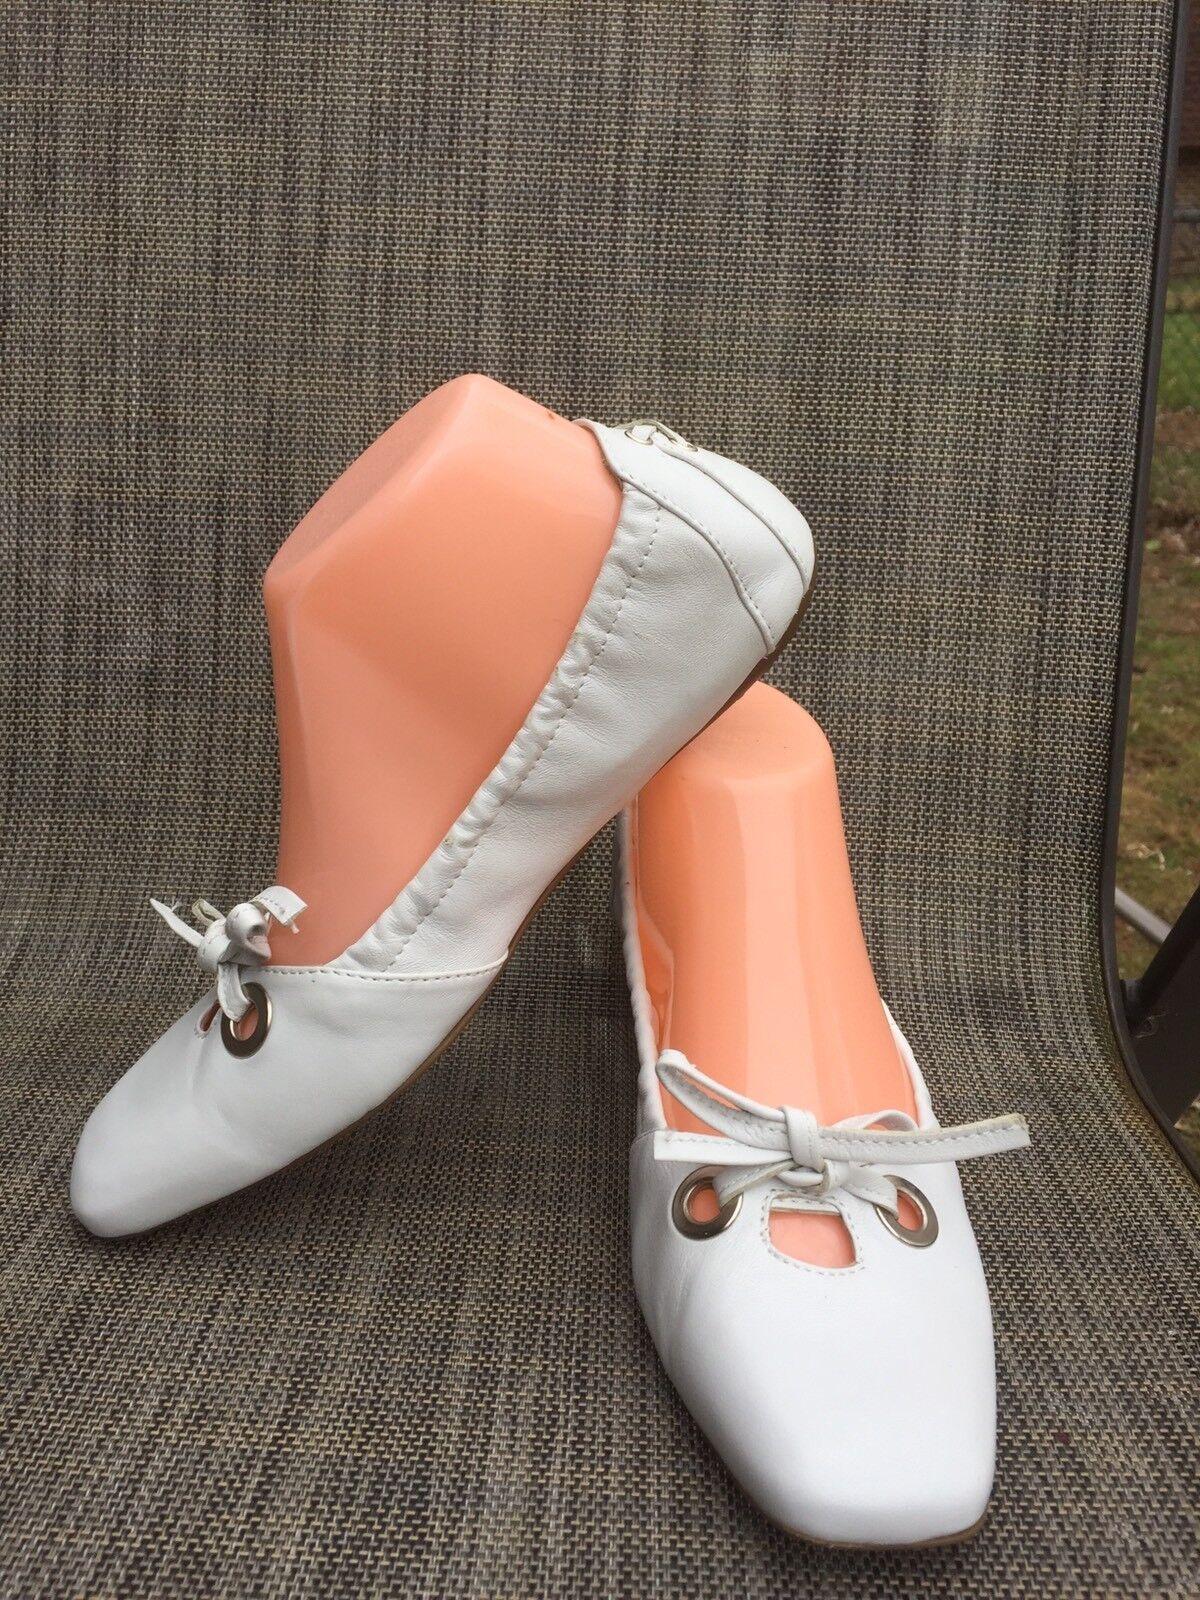 basso prezzo del 40% Rare STOKTON Donna bianca Leather Ballet Flat Flat Flat sz.37.5 7-7.5US w bow,  caldo